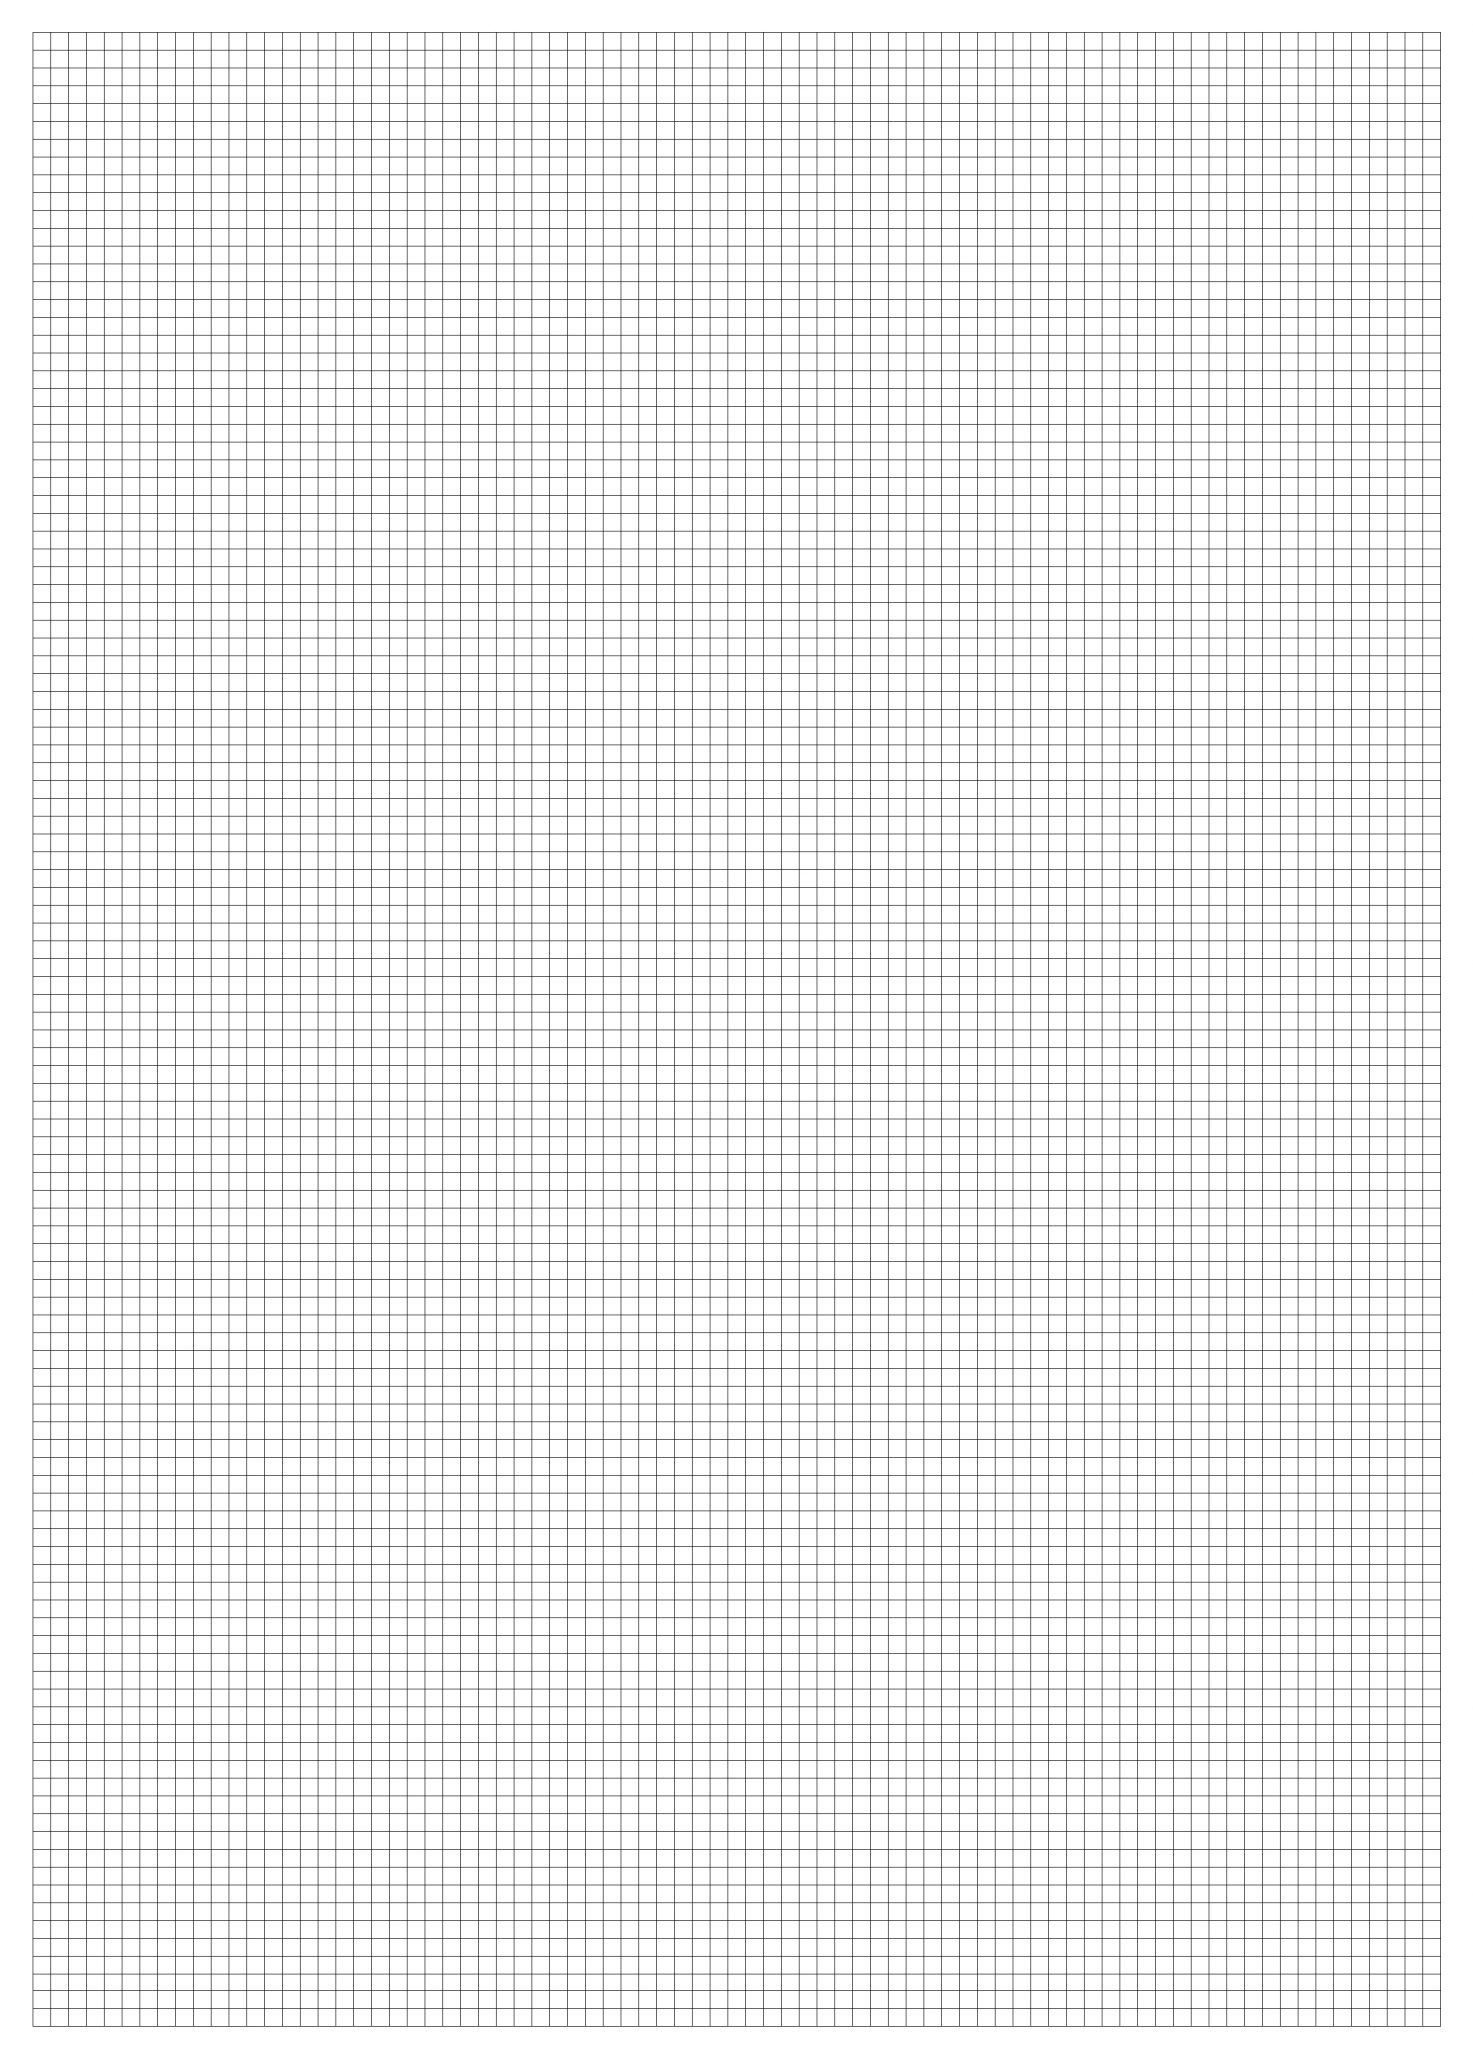 Graph Paper To Print Free Printable Calendar Templates Printable Graph Paper Graph Paper Free Printable Calendar Templates